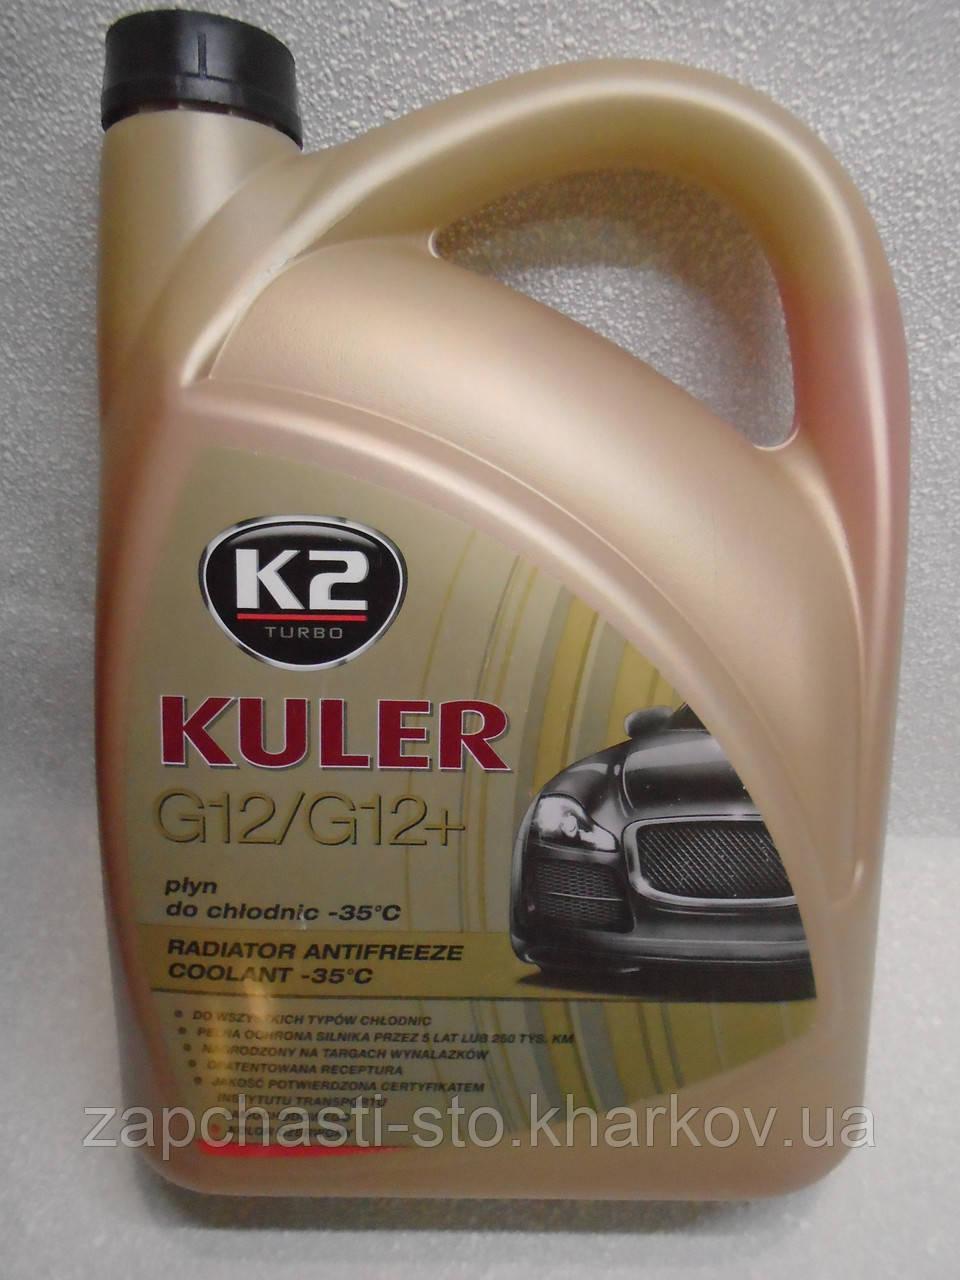 Антифриз красный K2 Kuler 5л -35 G12/G12+